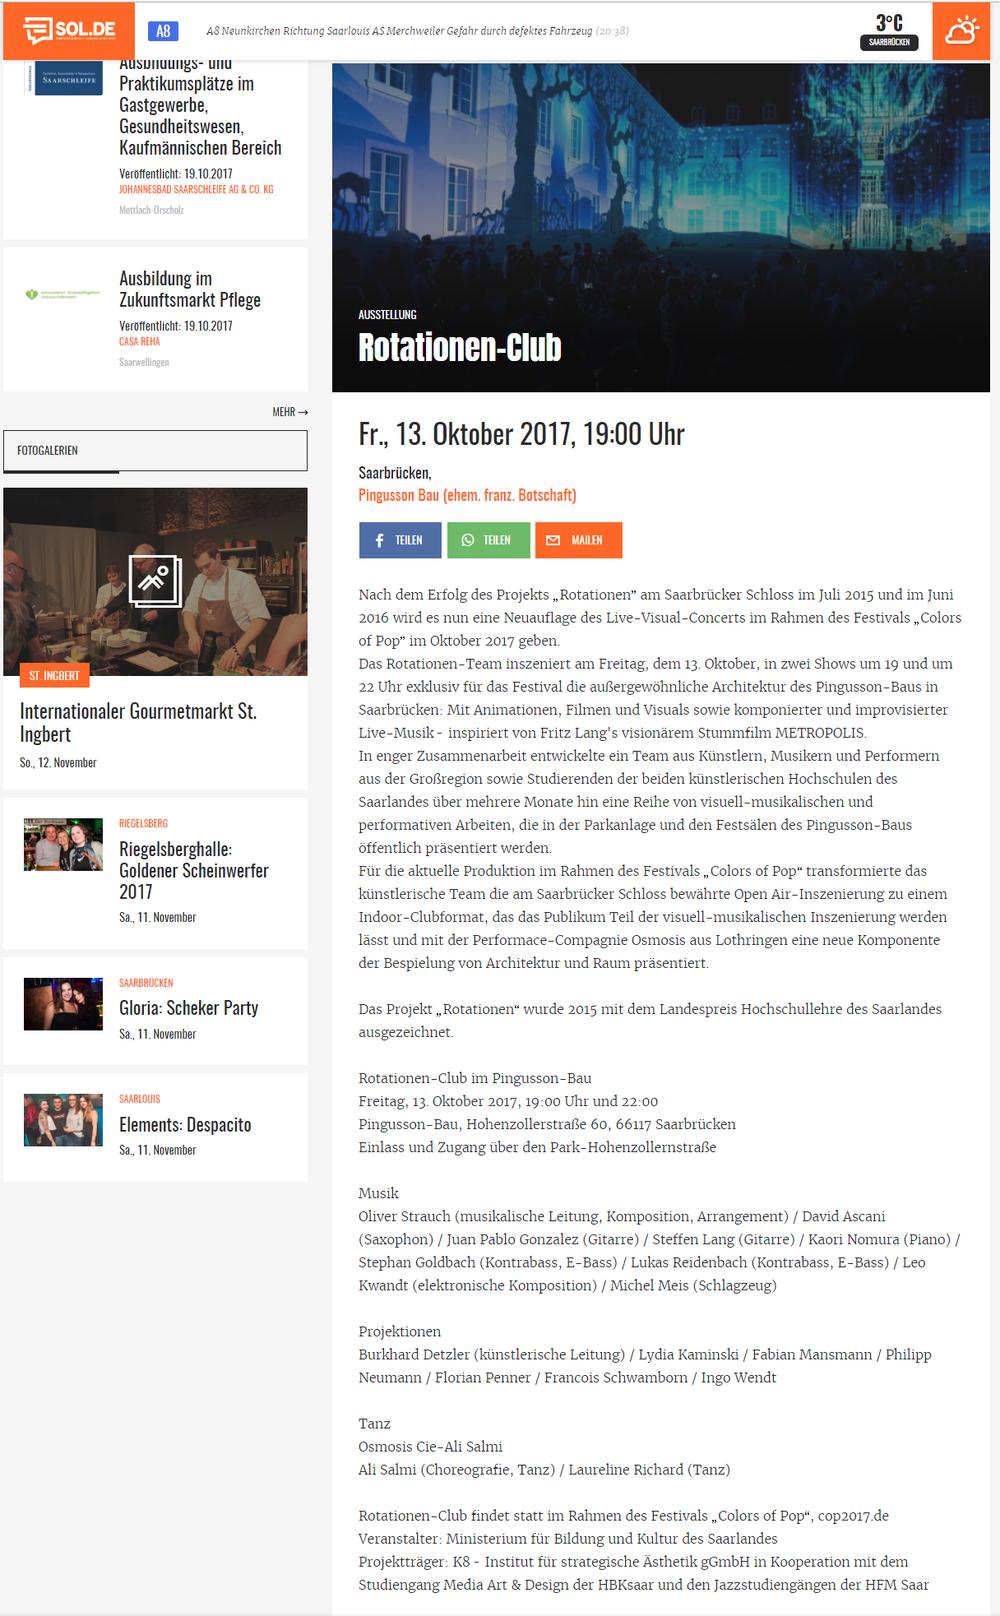 17_Ausstellungsankündigung_Rotationen-Club.png